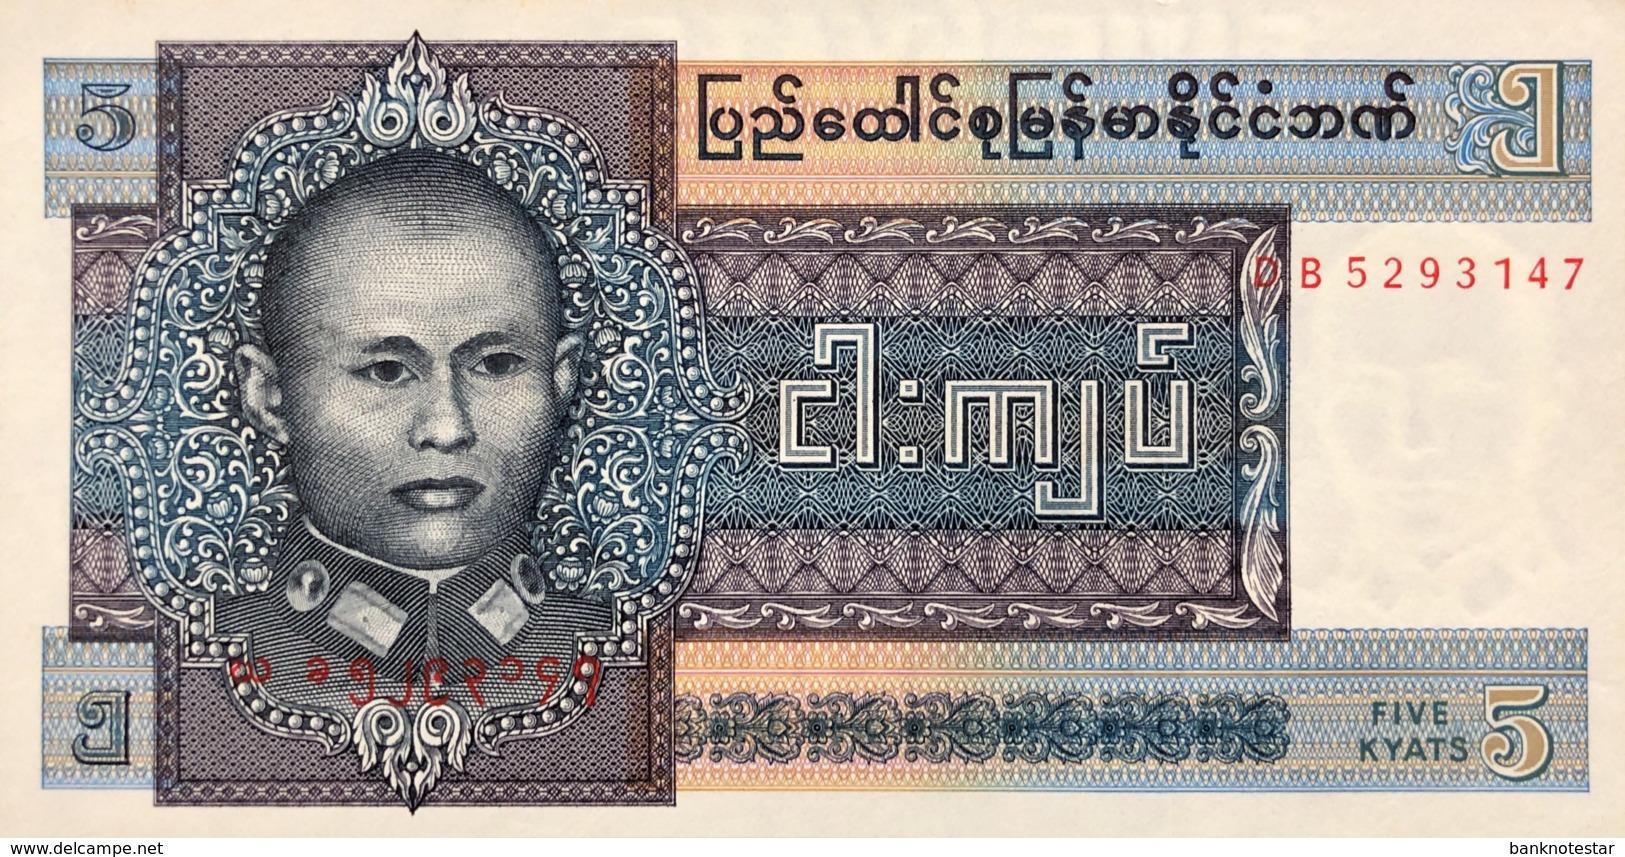 Myanmar 5 Kyat, P-57 (1973) - UNC - Myanmar